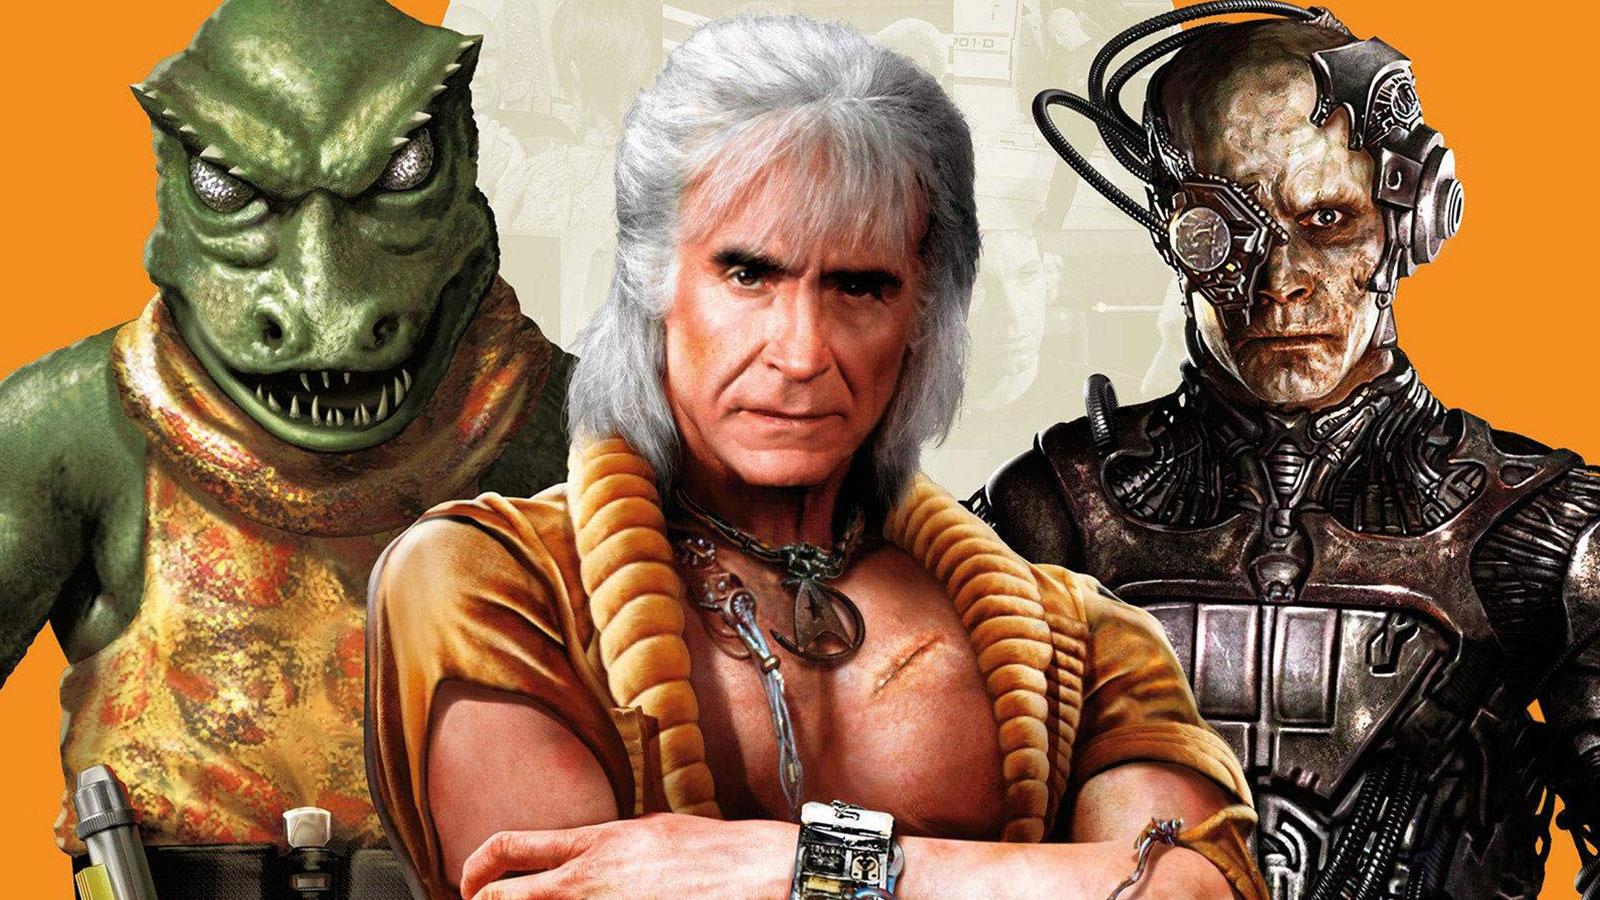 Preview: STAR TREK: VILLAINS Examines Starfleet's Most Dangerous Adversaries